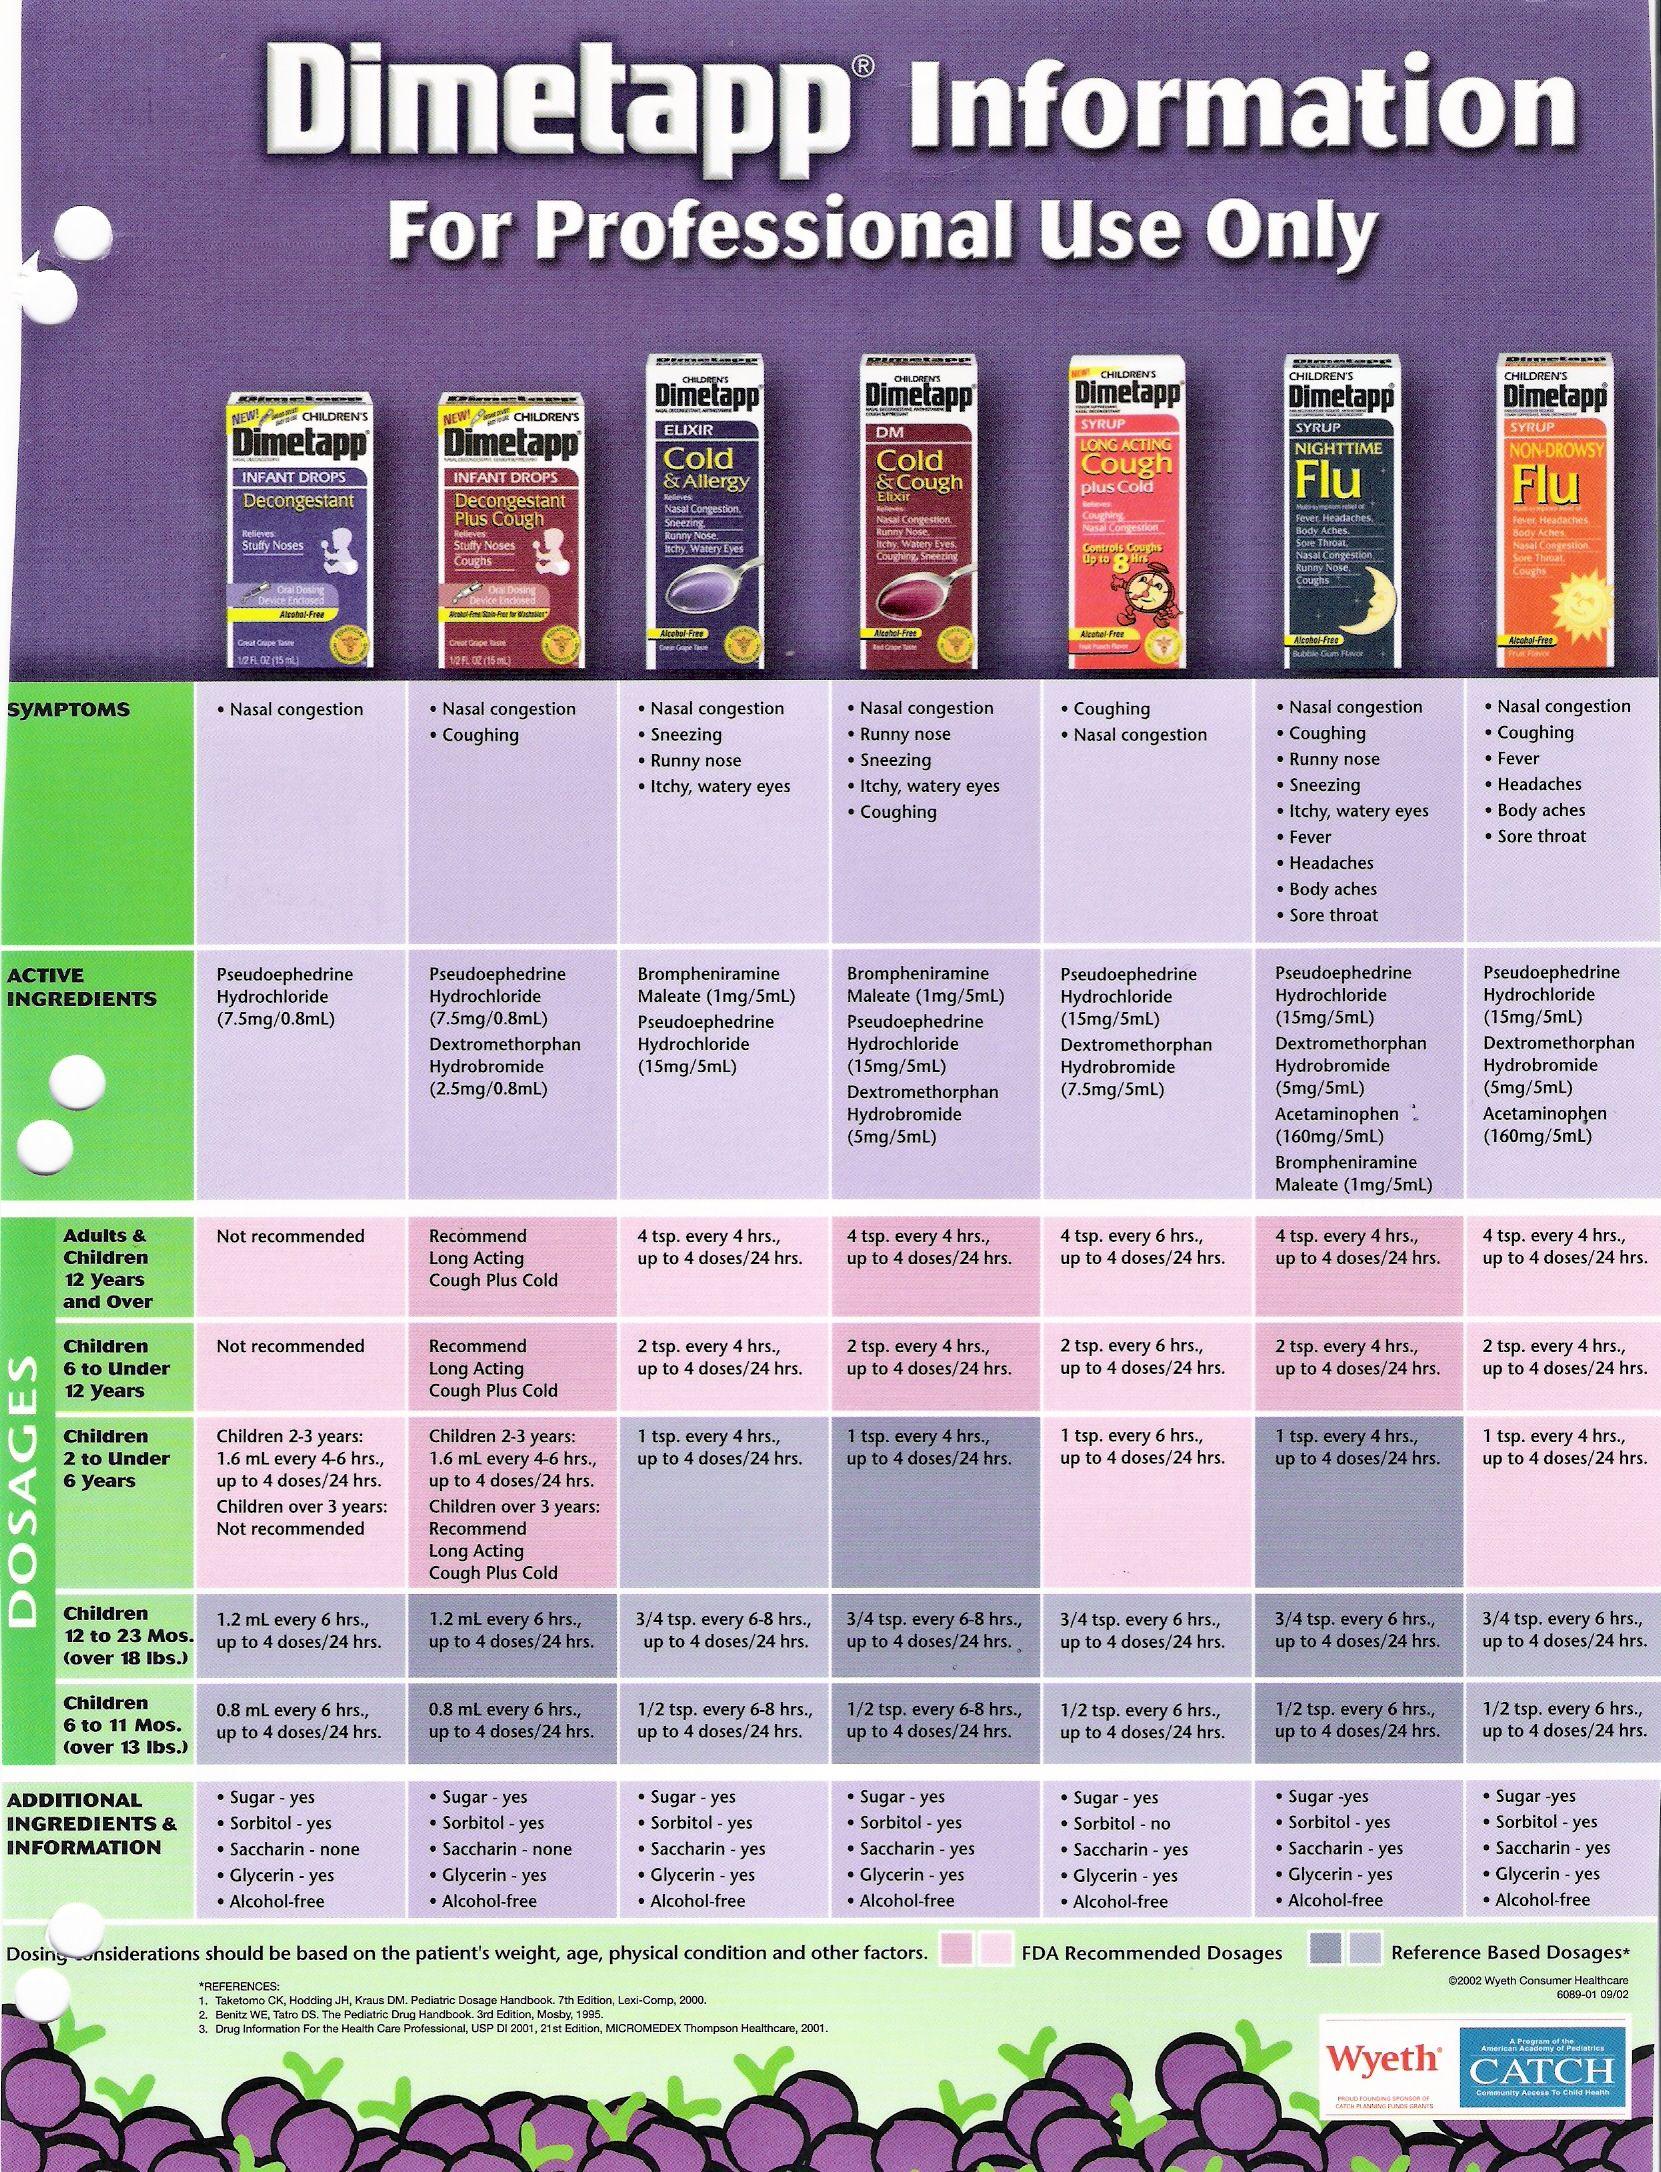 Dimetapp Dosage Chart : dimetapp, dosage, chart, Dimetapp, Dosing, Keith, Ramsey, Pediatrics-, Jordan, Pediatrician, Pediatrics,, Cold,, Health